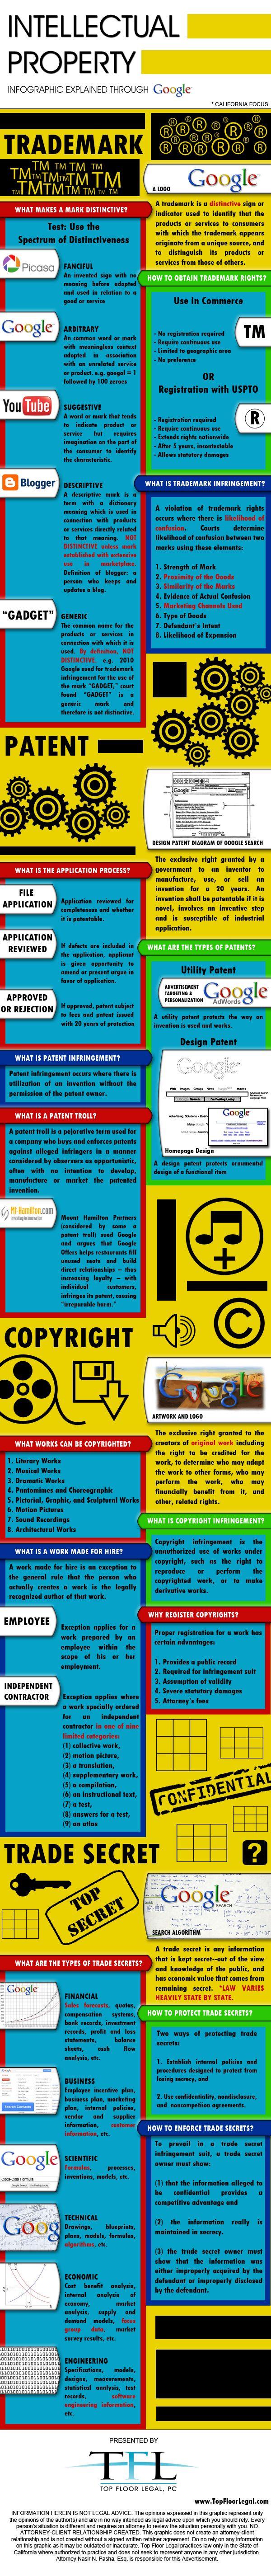 Understanding Intellectual Property - Trademarks, copyrights, etc. #infographic #ip #intellectualproperty #trademark